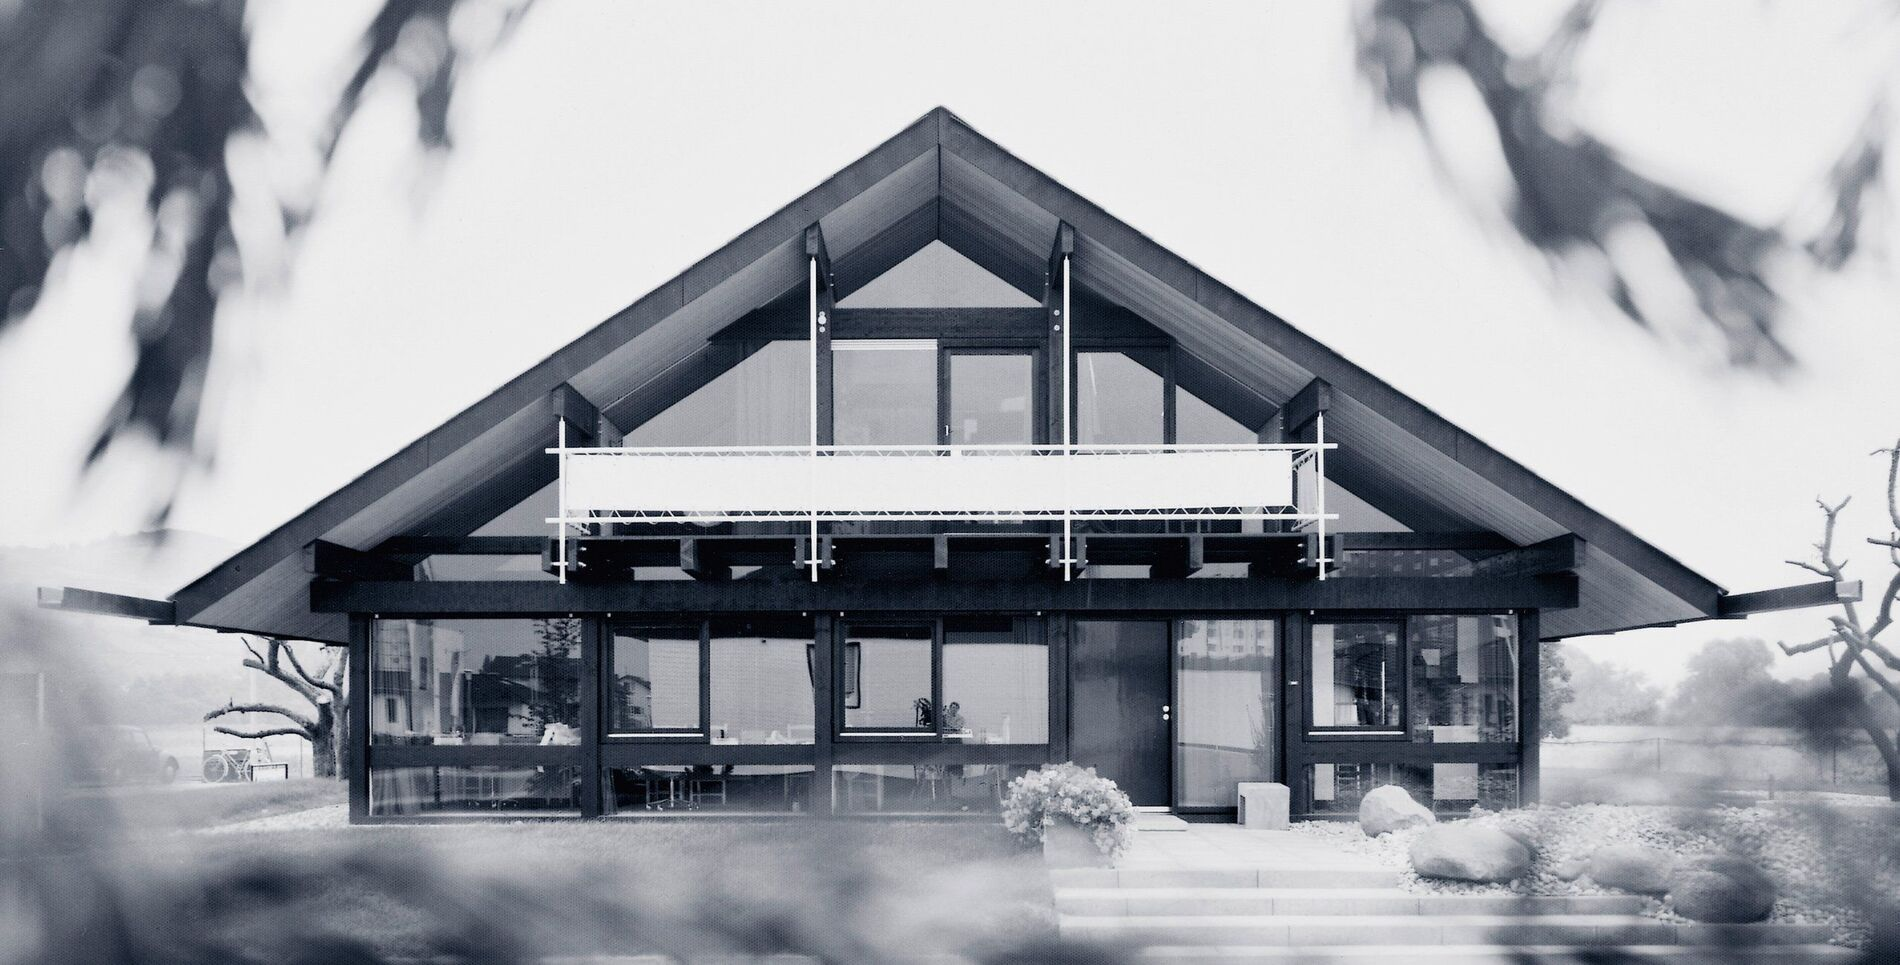 huf haus preisliste 2016 10679 made house decor. Black Bedroom Furniture Sets. Home Design Ideas